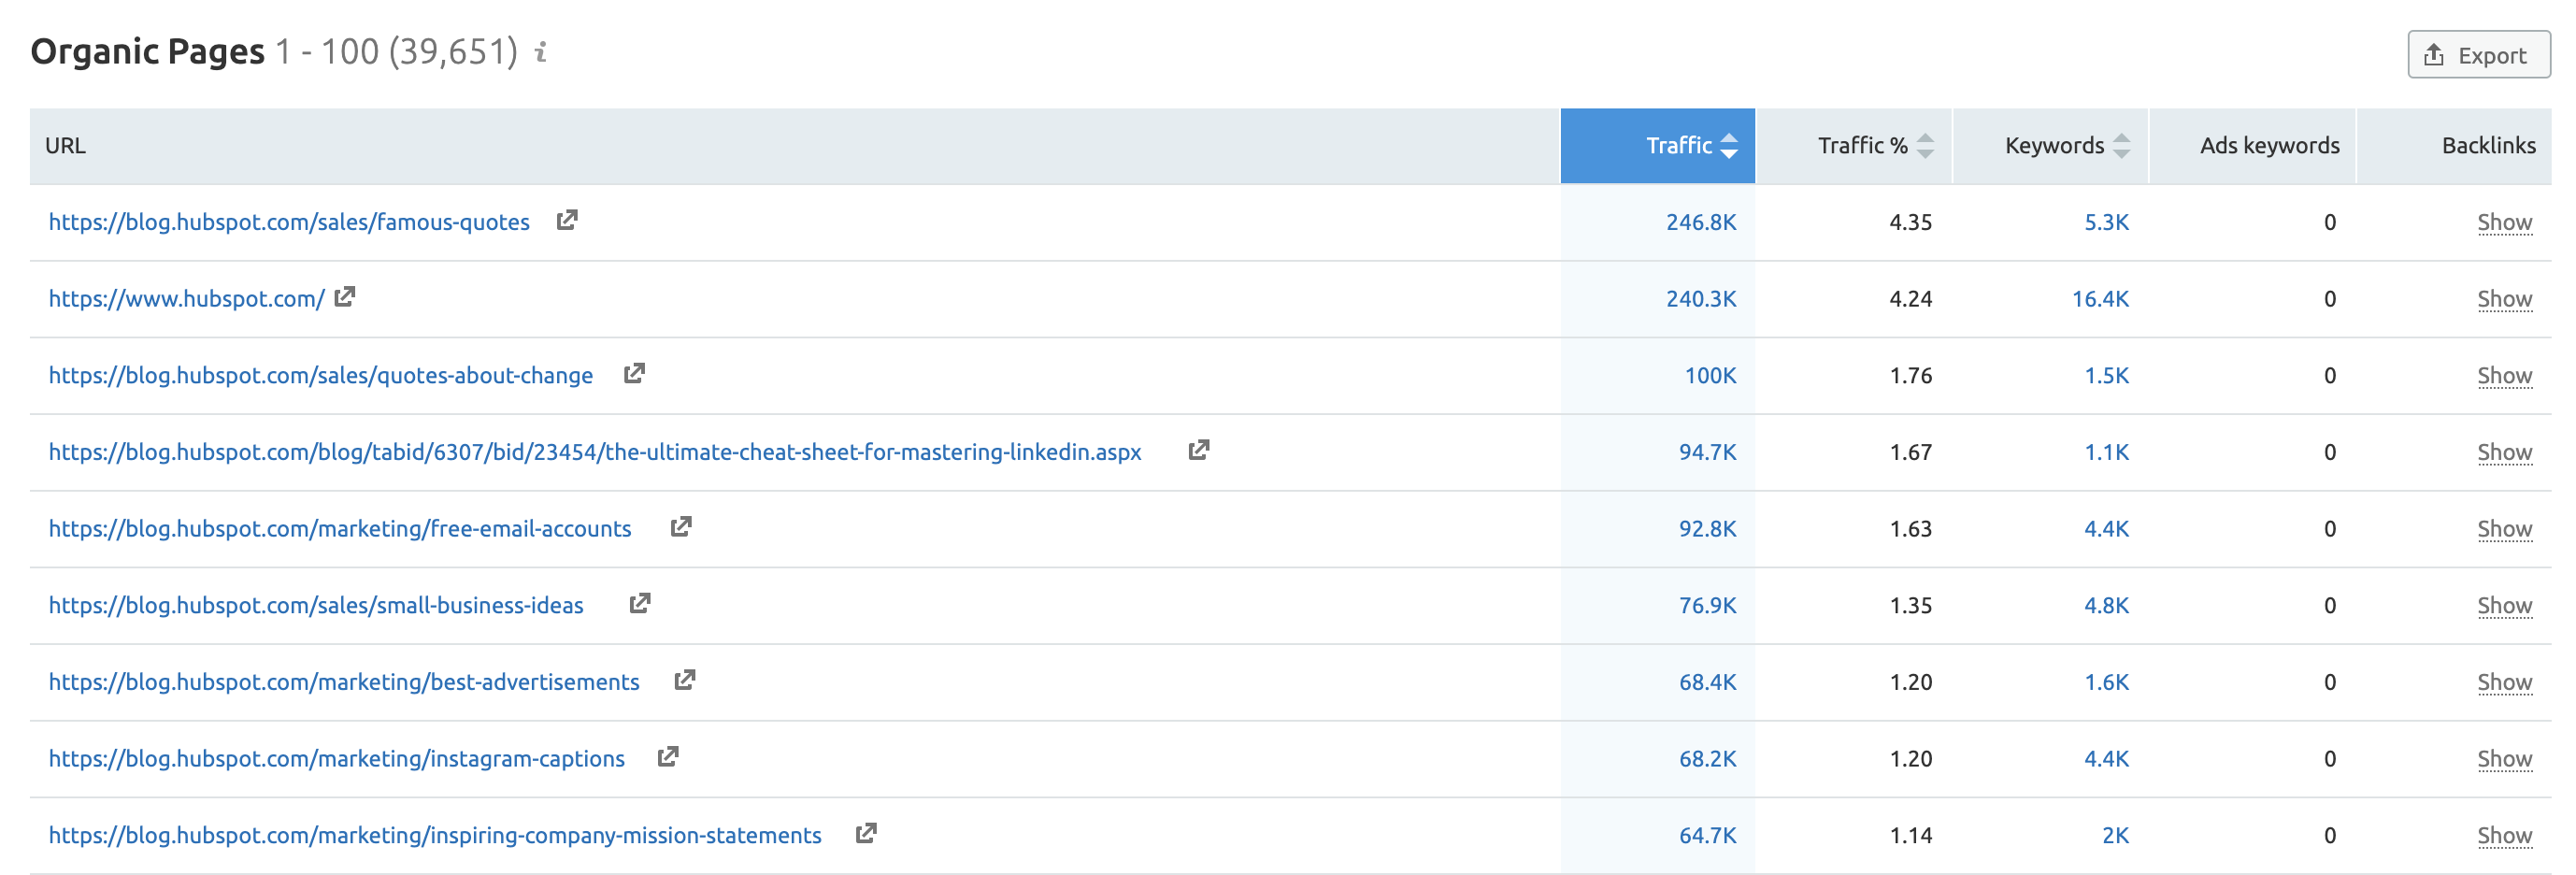 Organic Research Tool top traffic reports